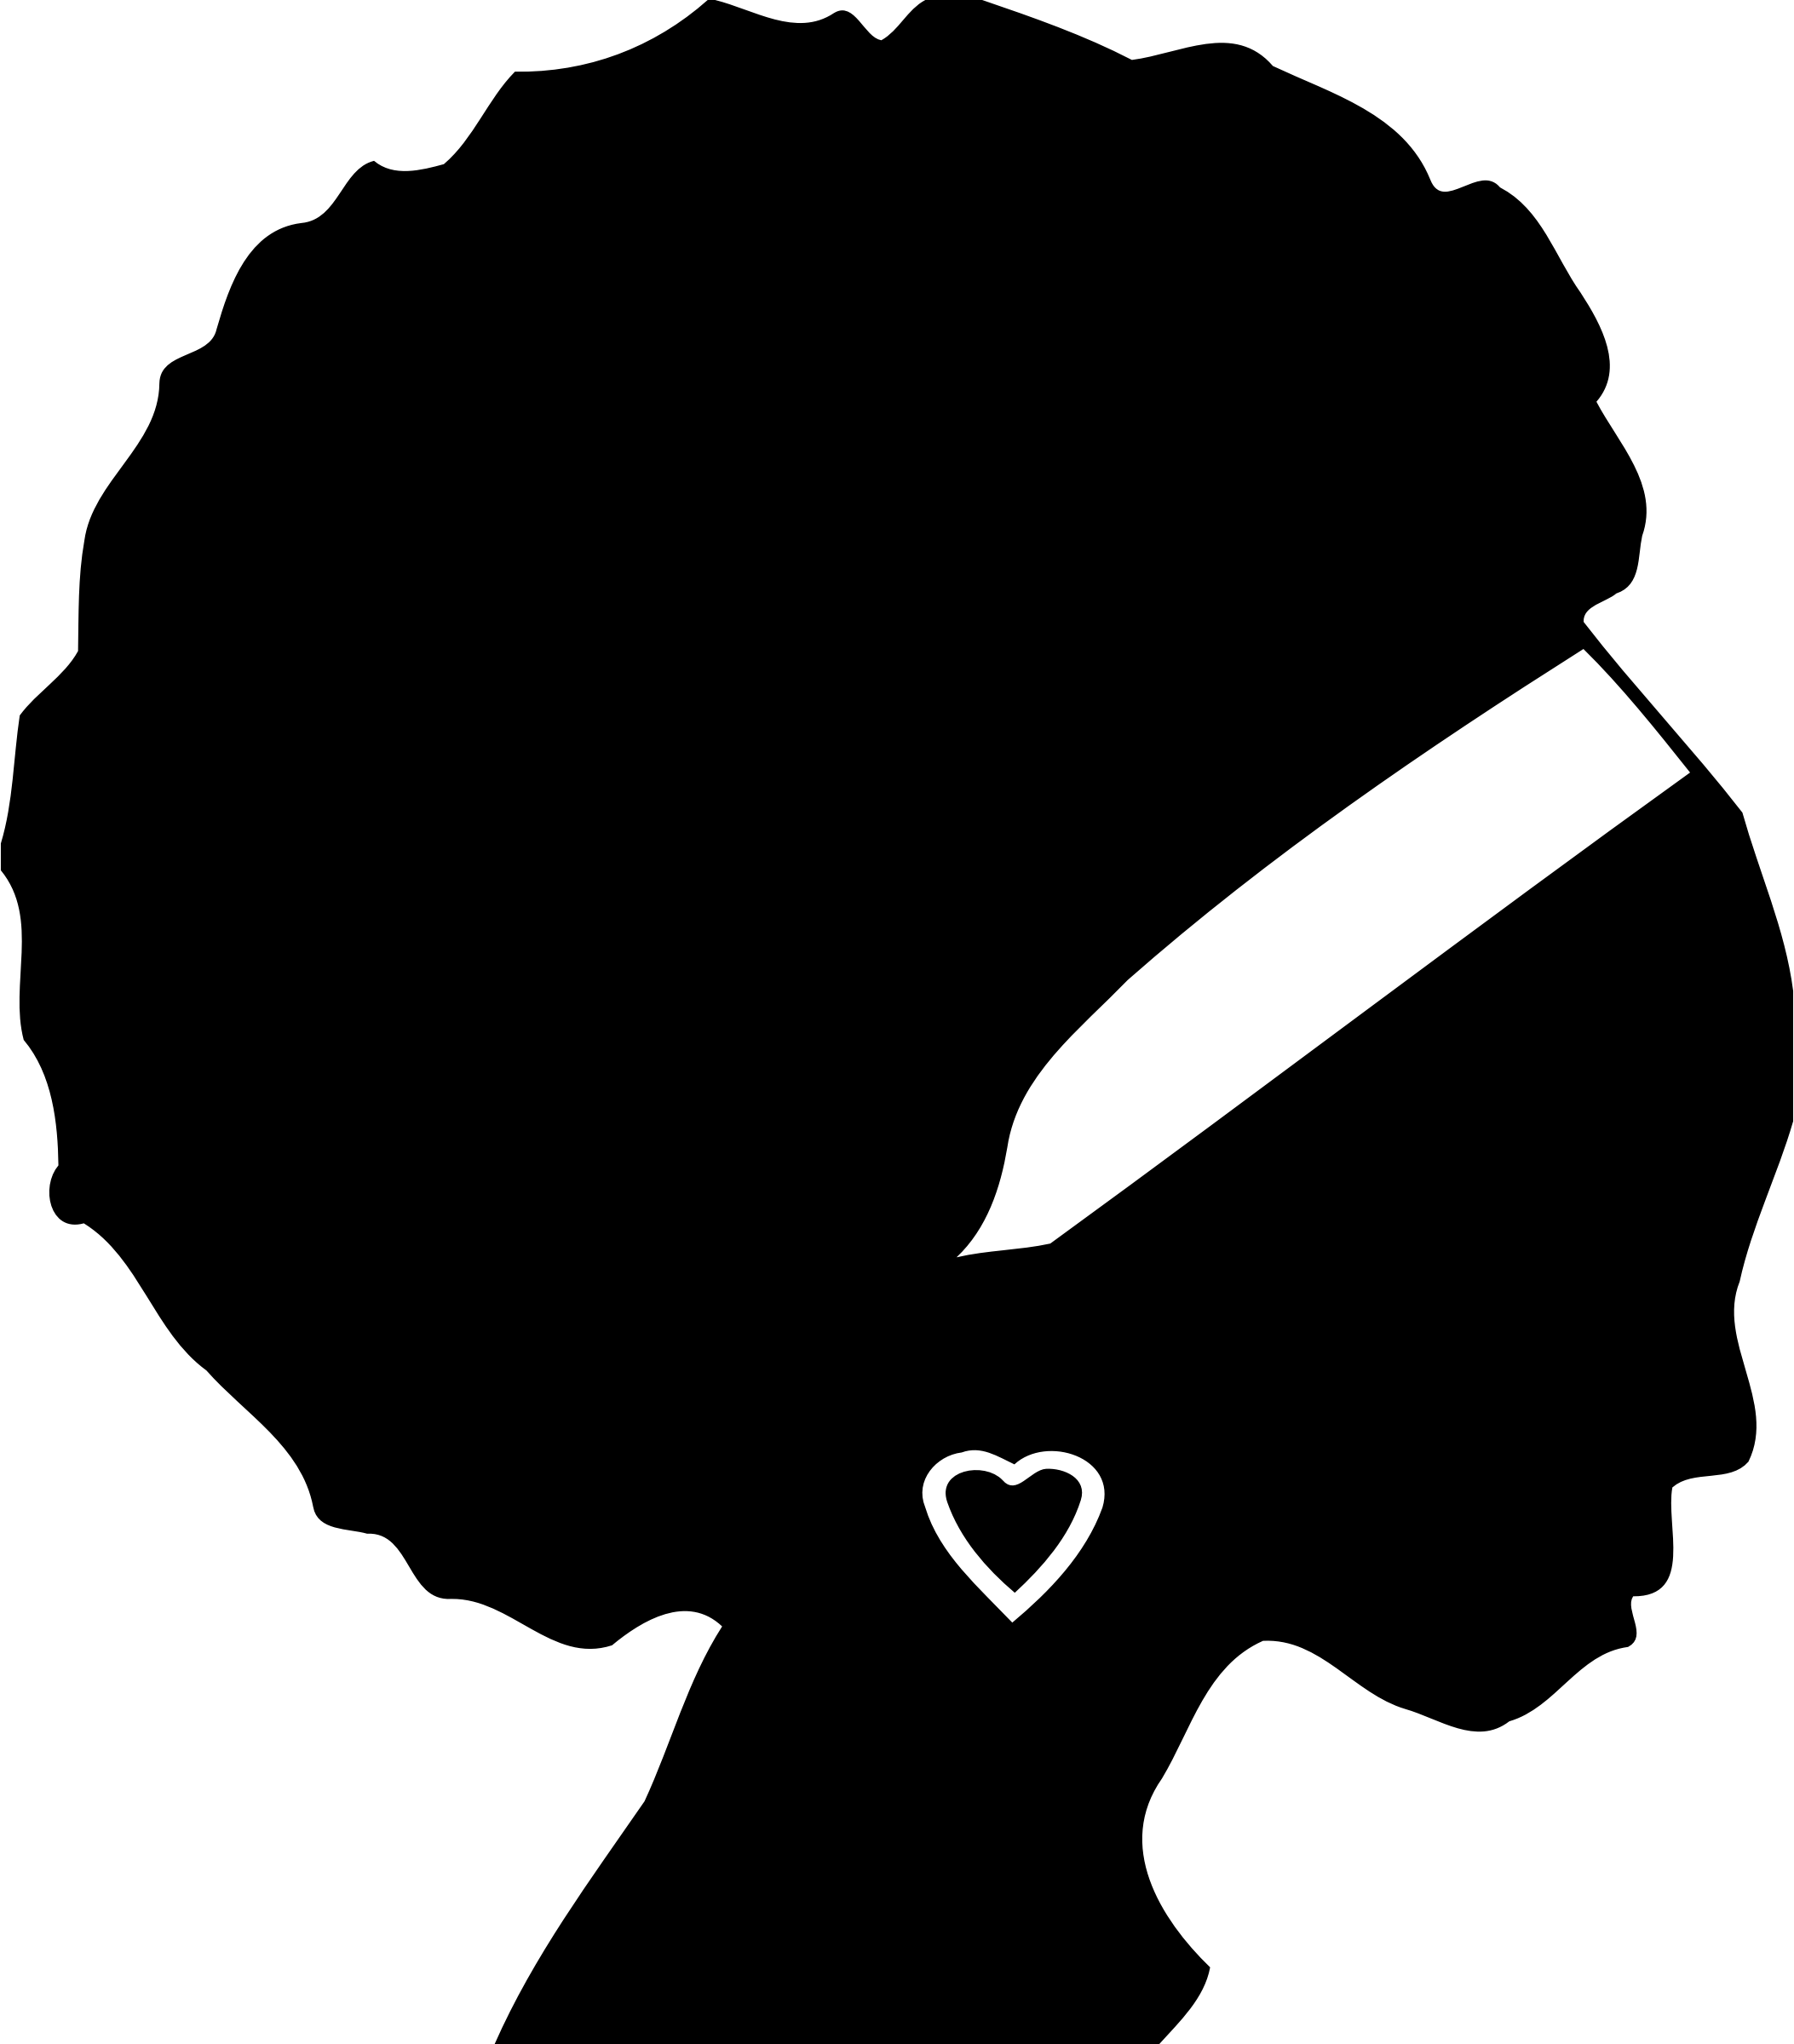 2106x2400 Clipart